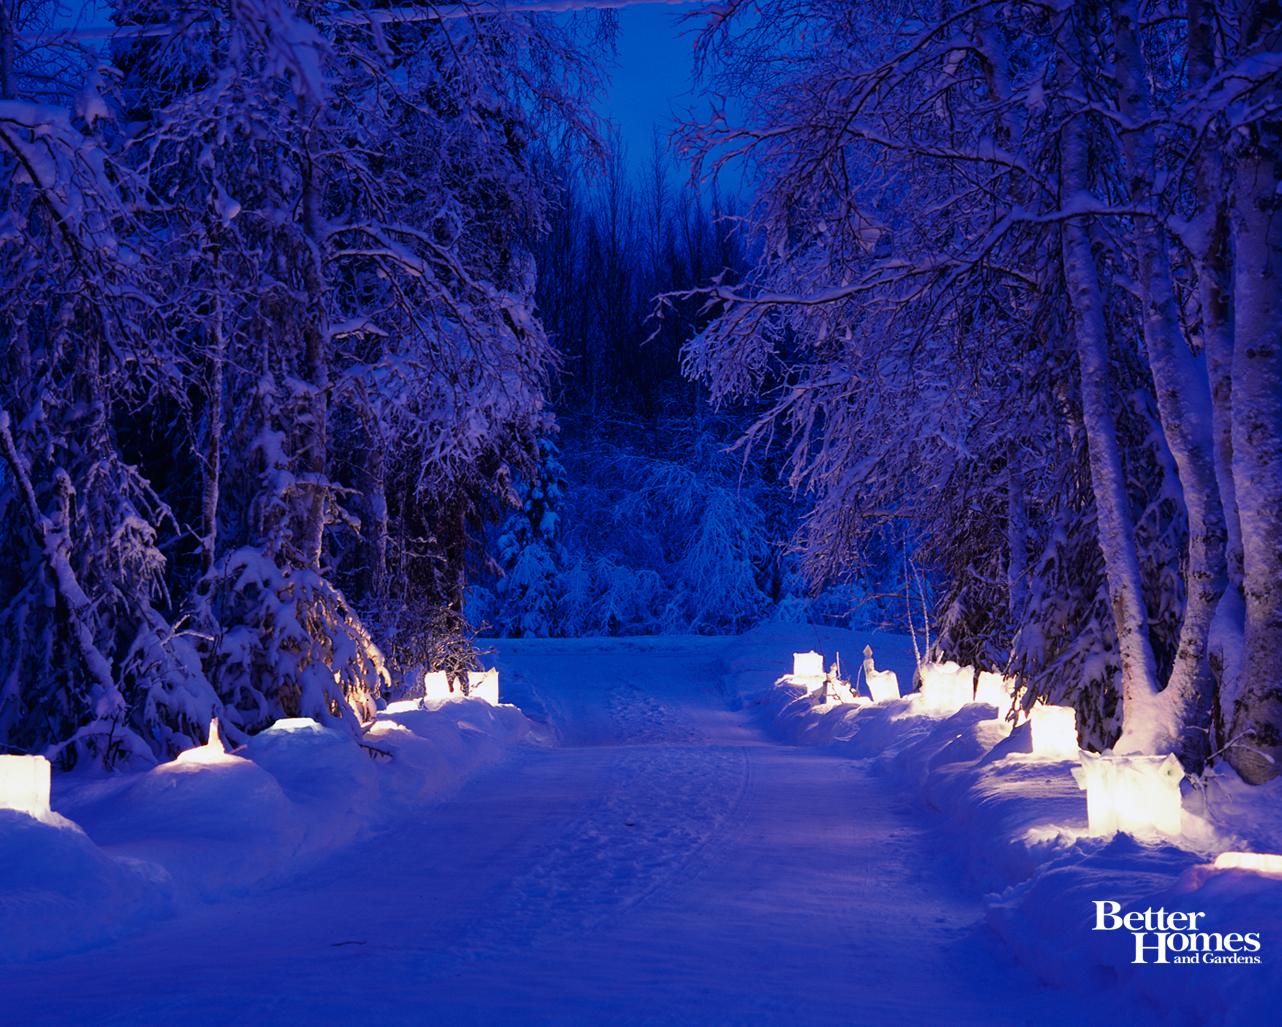 winter-Free-Winter-Wonder-Desktop-wallpaper-wp4210713